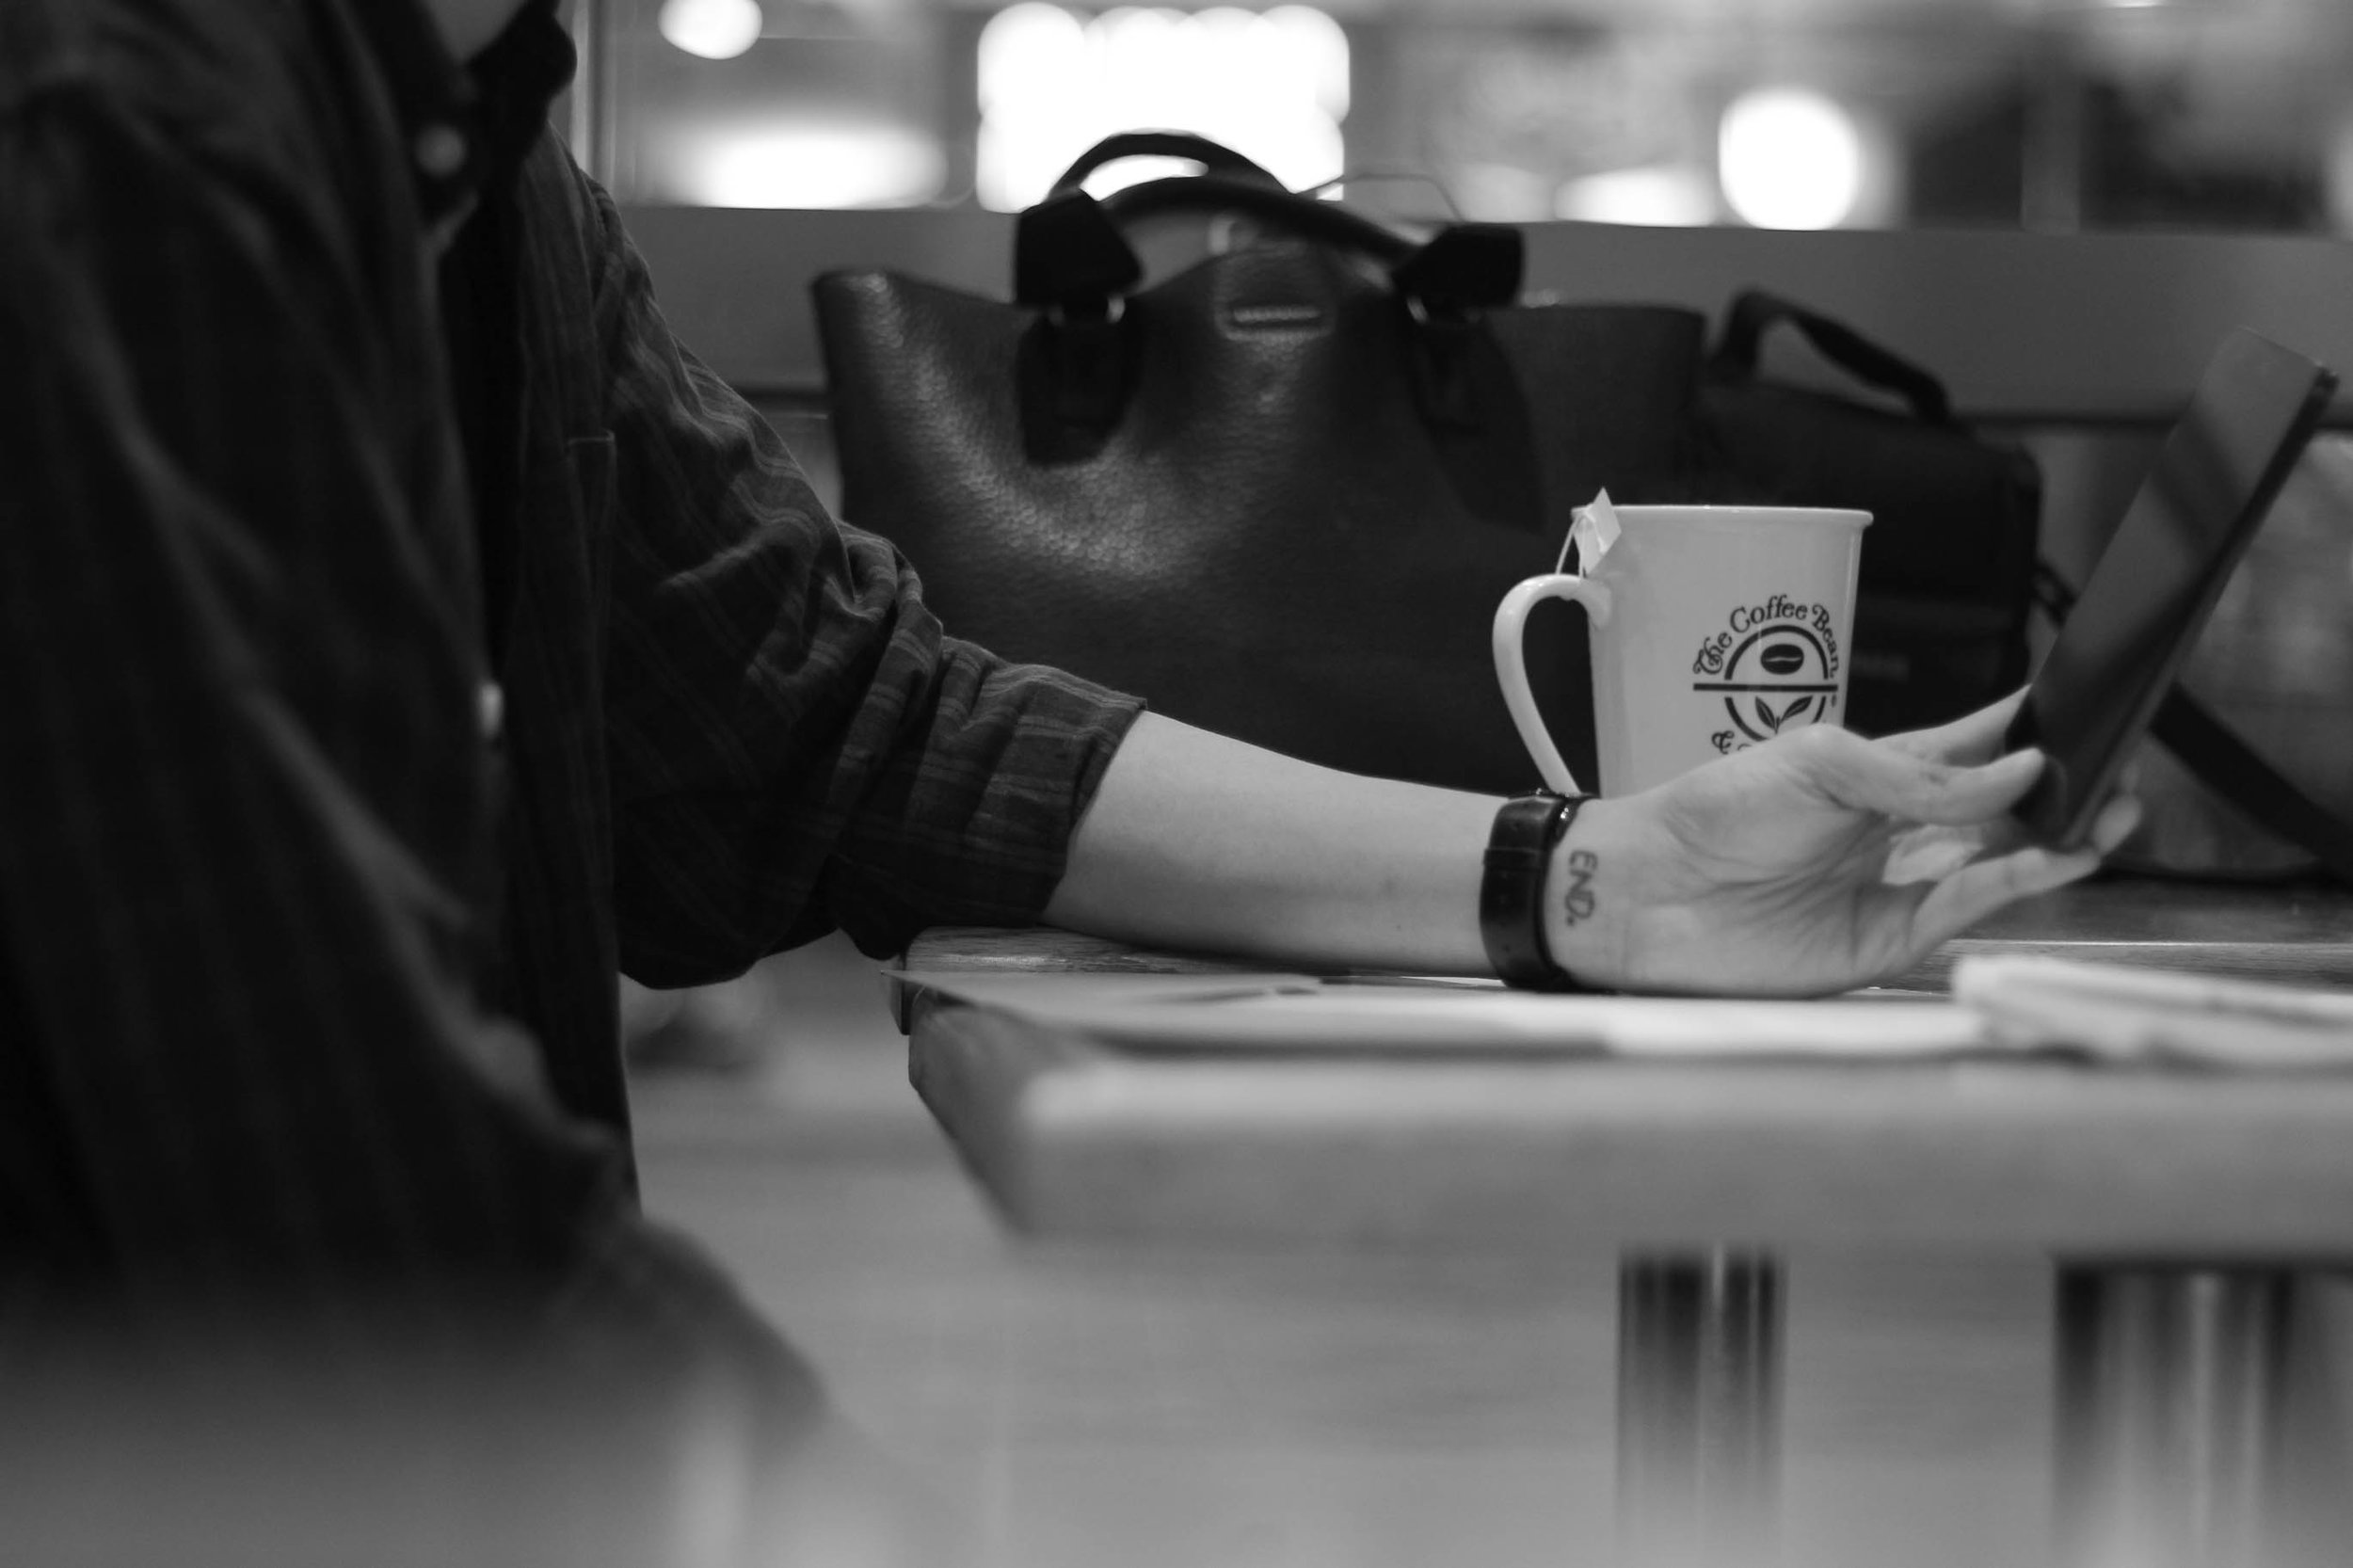 man-coffeeshop-smartphone.jpeg